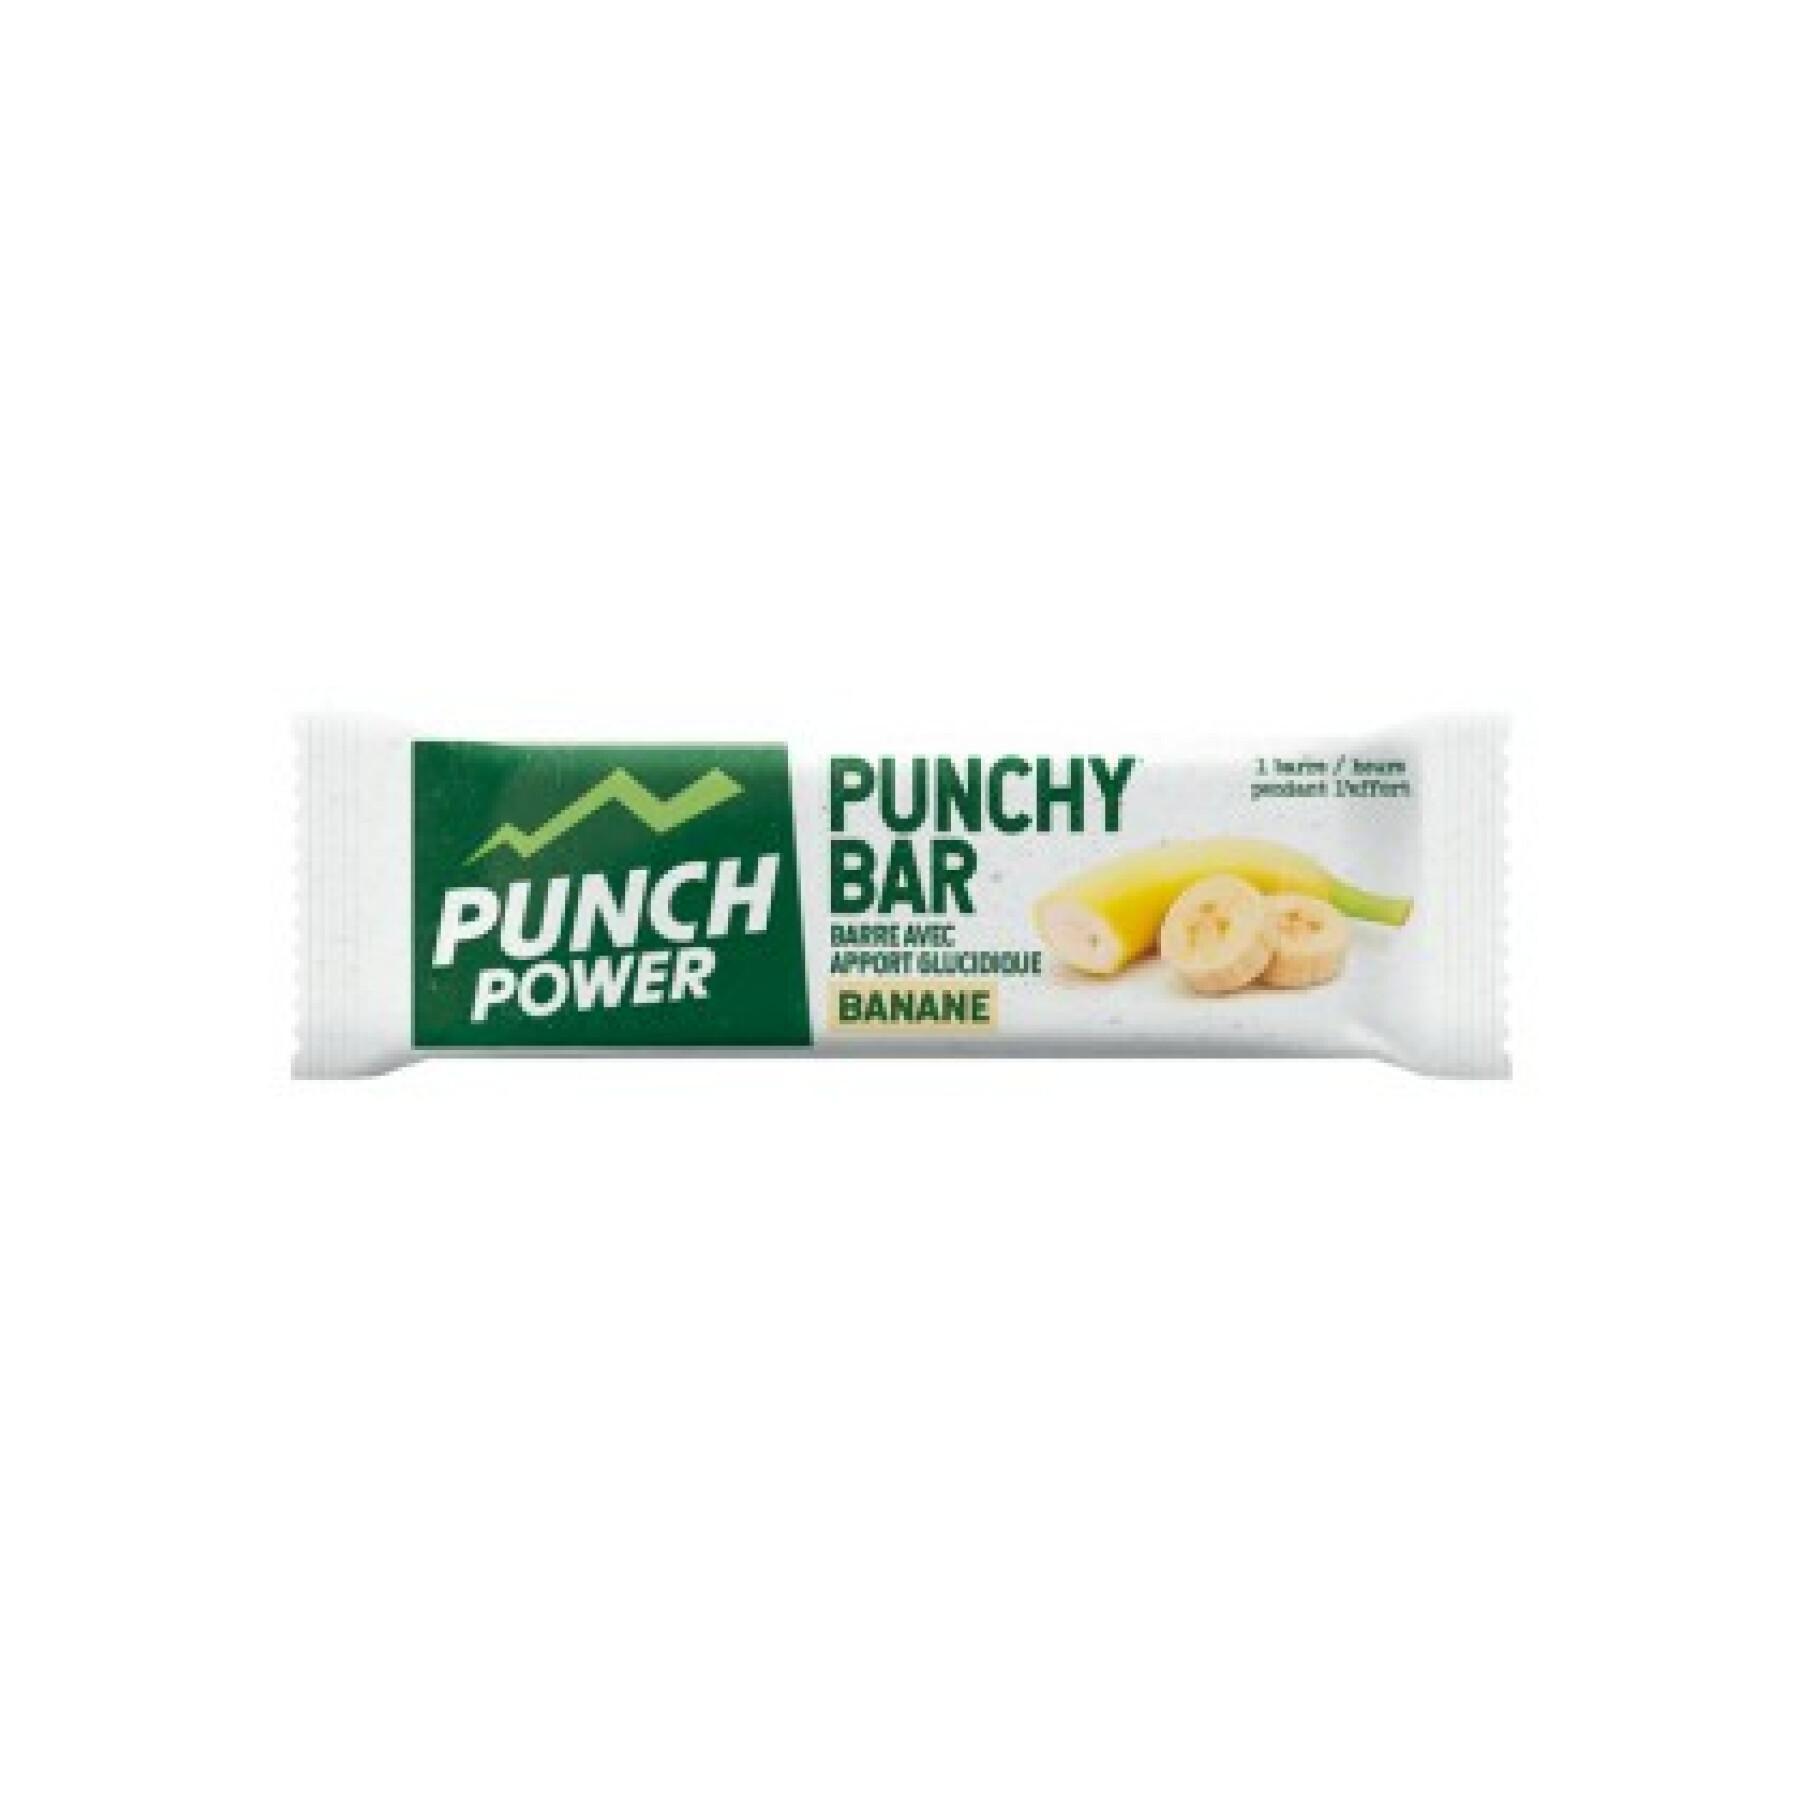 Display 40 energy bars Punch Power Punchybar Banane